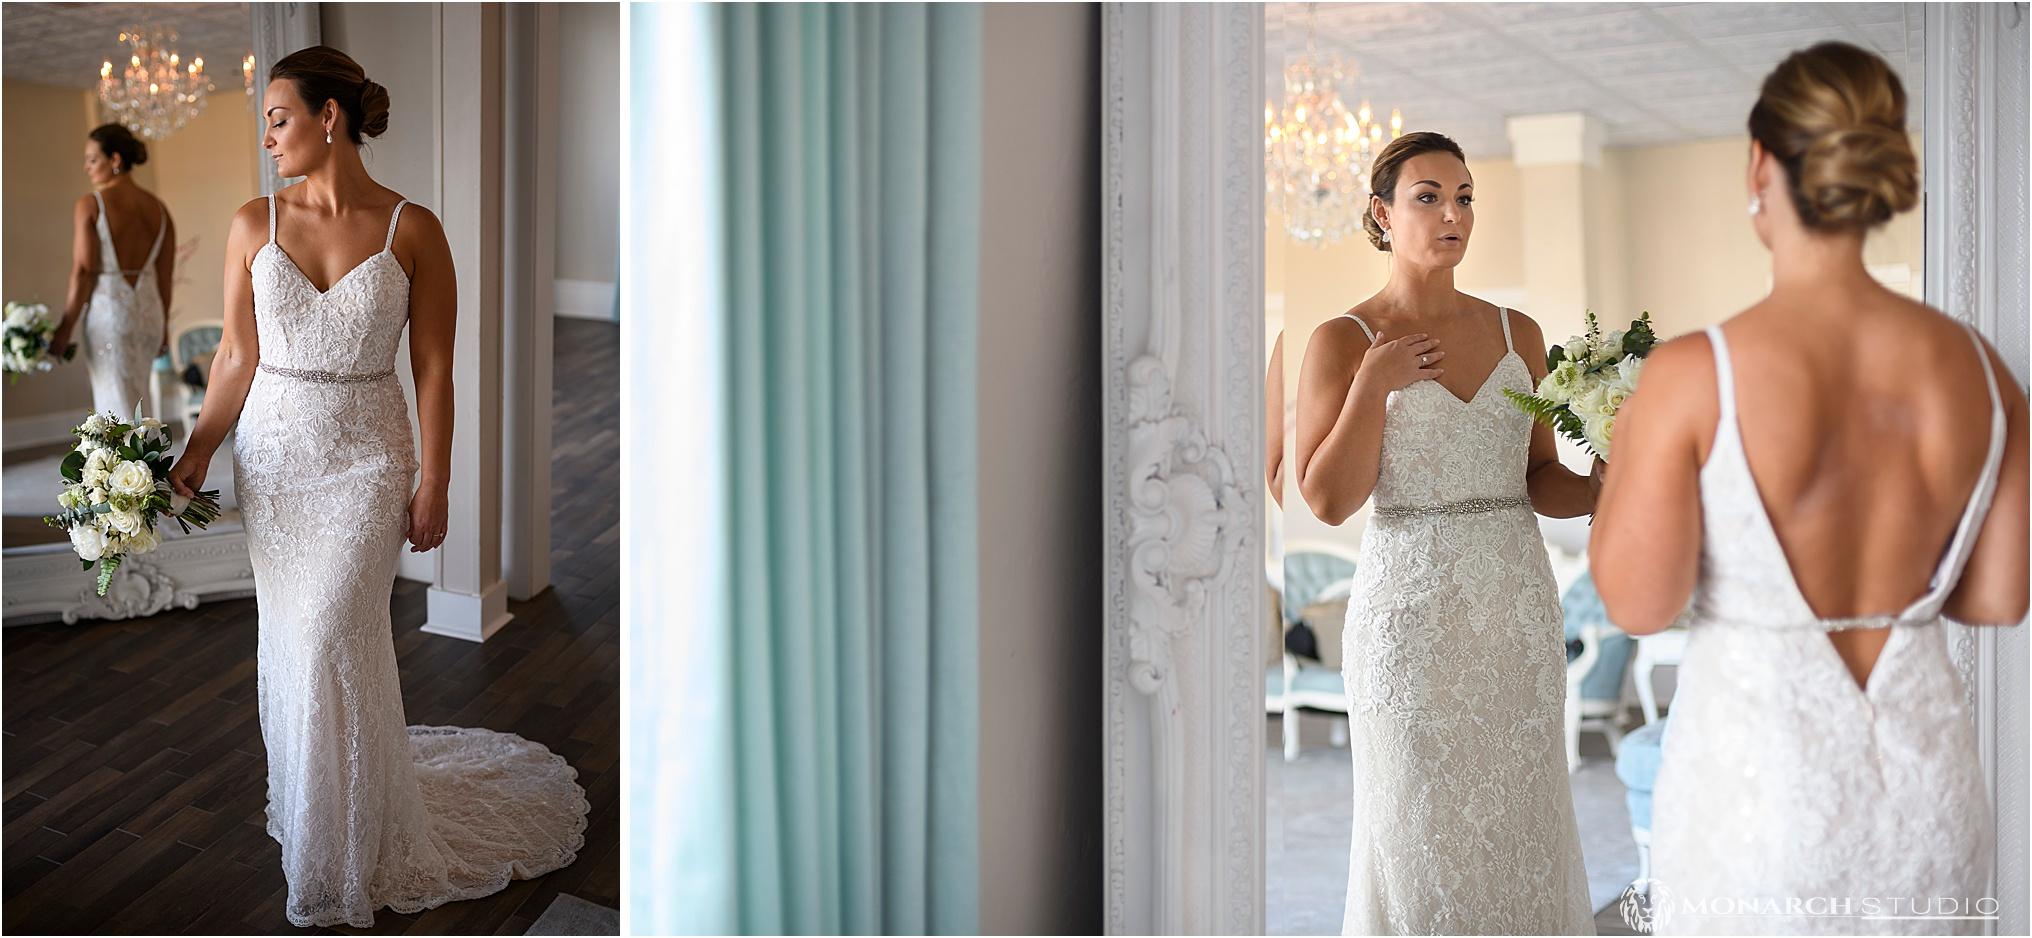 036-whiteroom-wedding-photographer-2019-05-22_0018.jpg